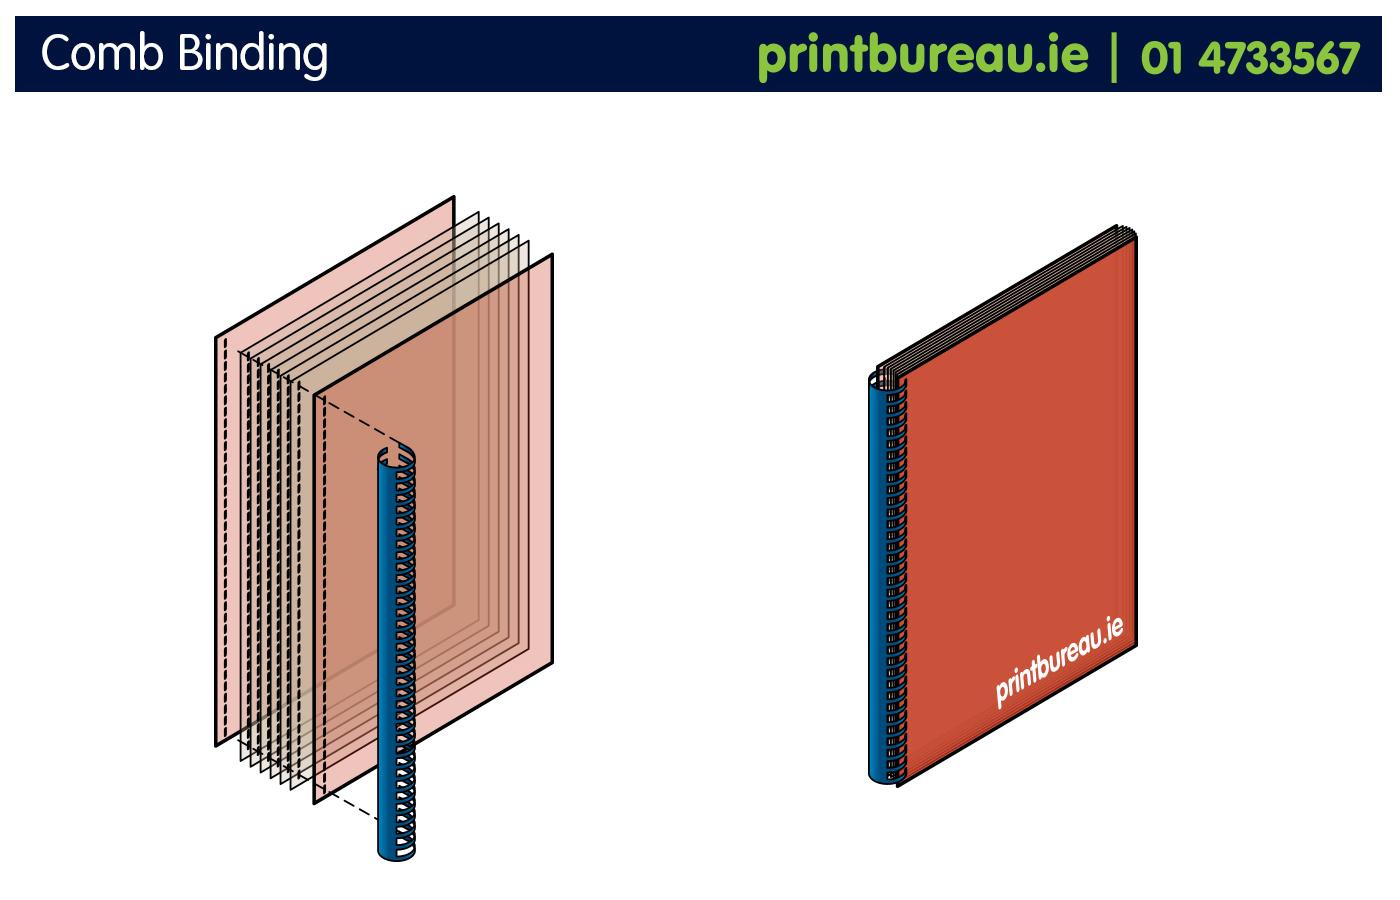 Print Bureau Comb Binding